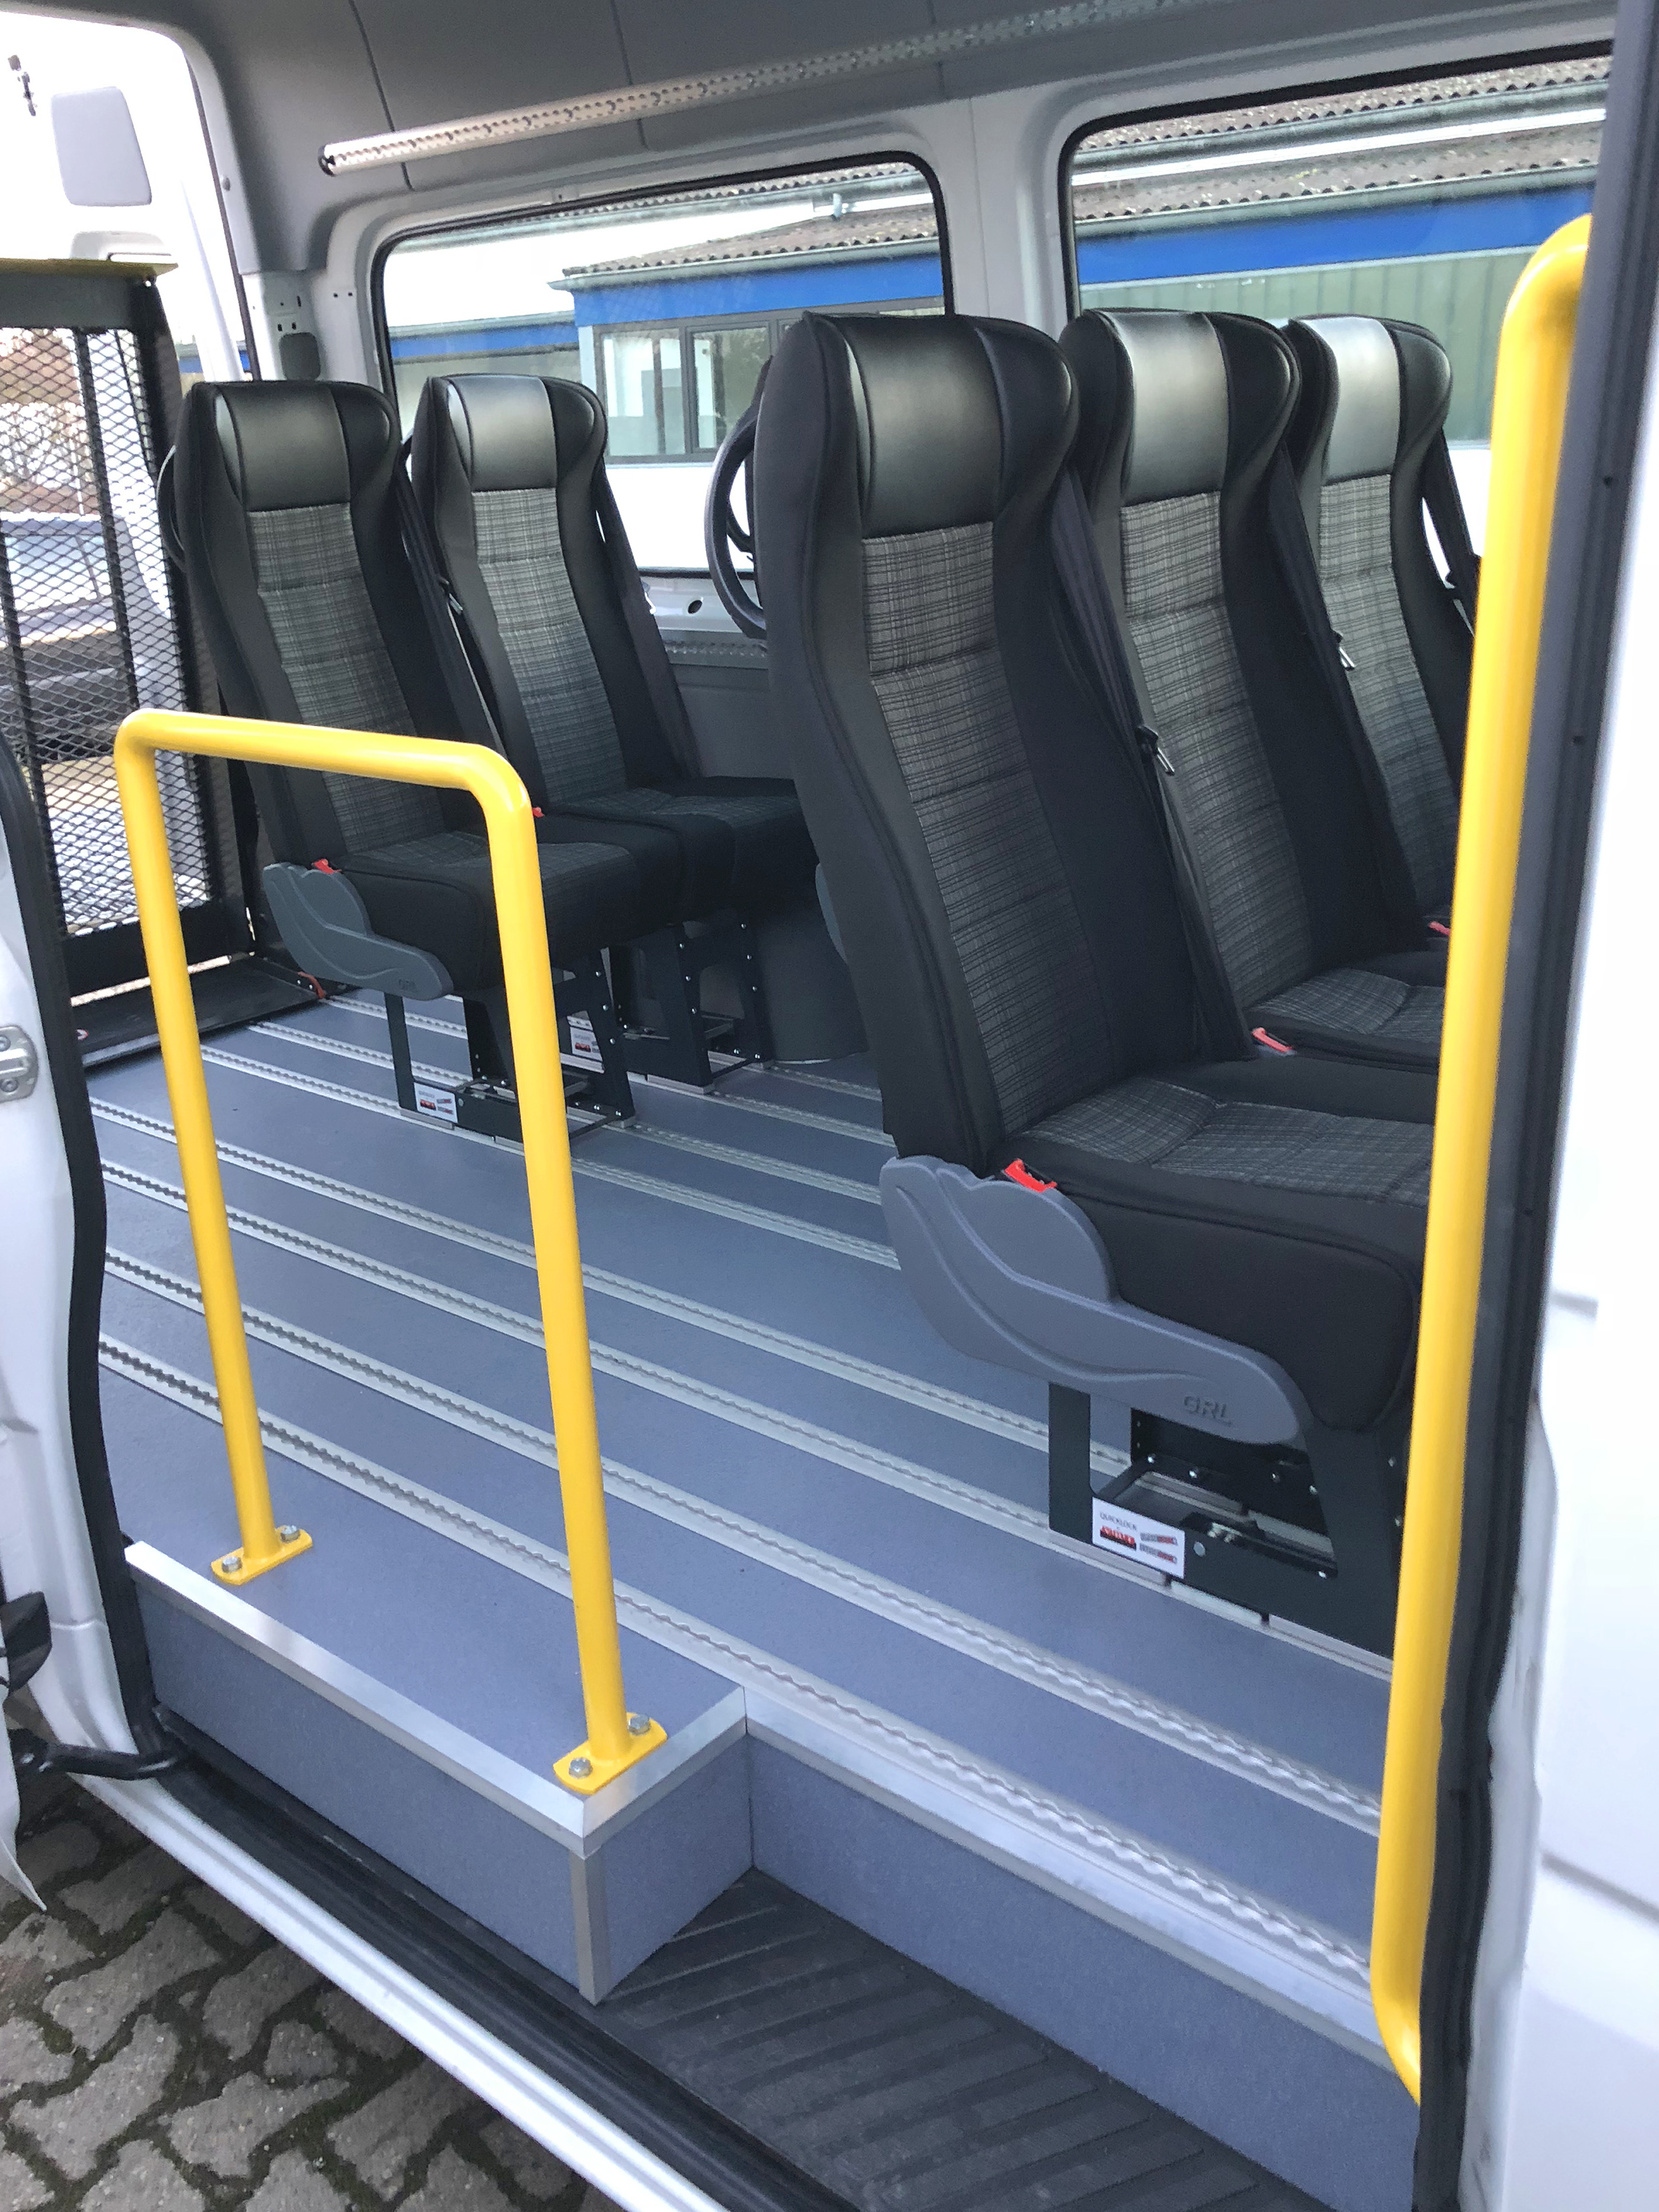 mb sprinter 9 sitzer minibus autovermietung nrw. Black Bedroom Furniture Sets. Home Design Ideas